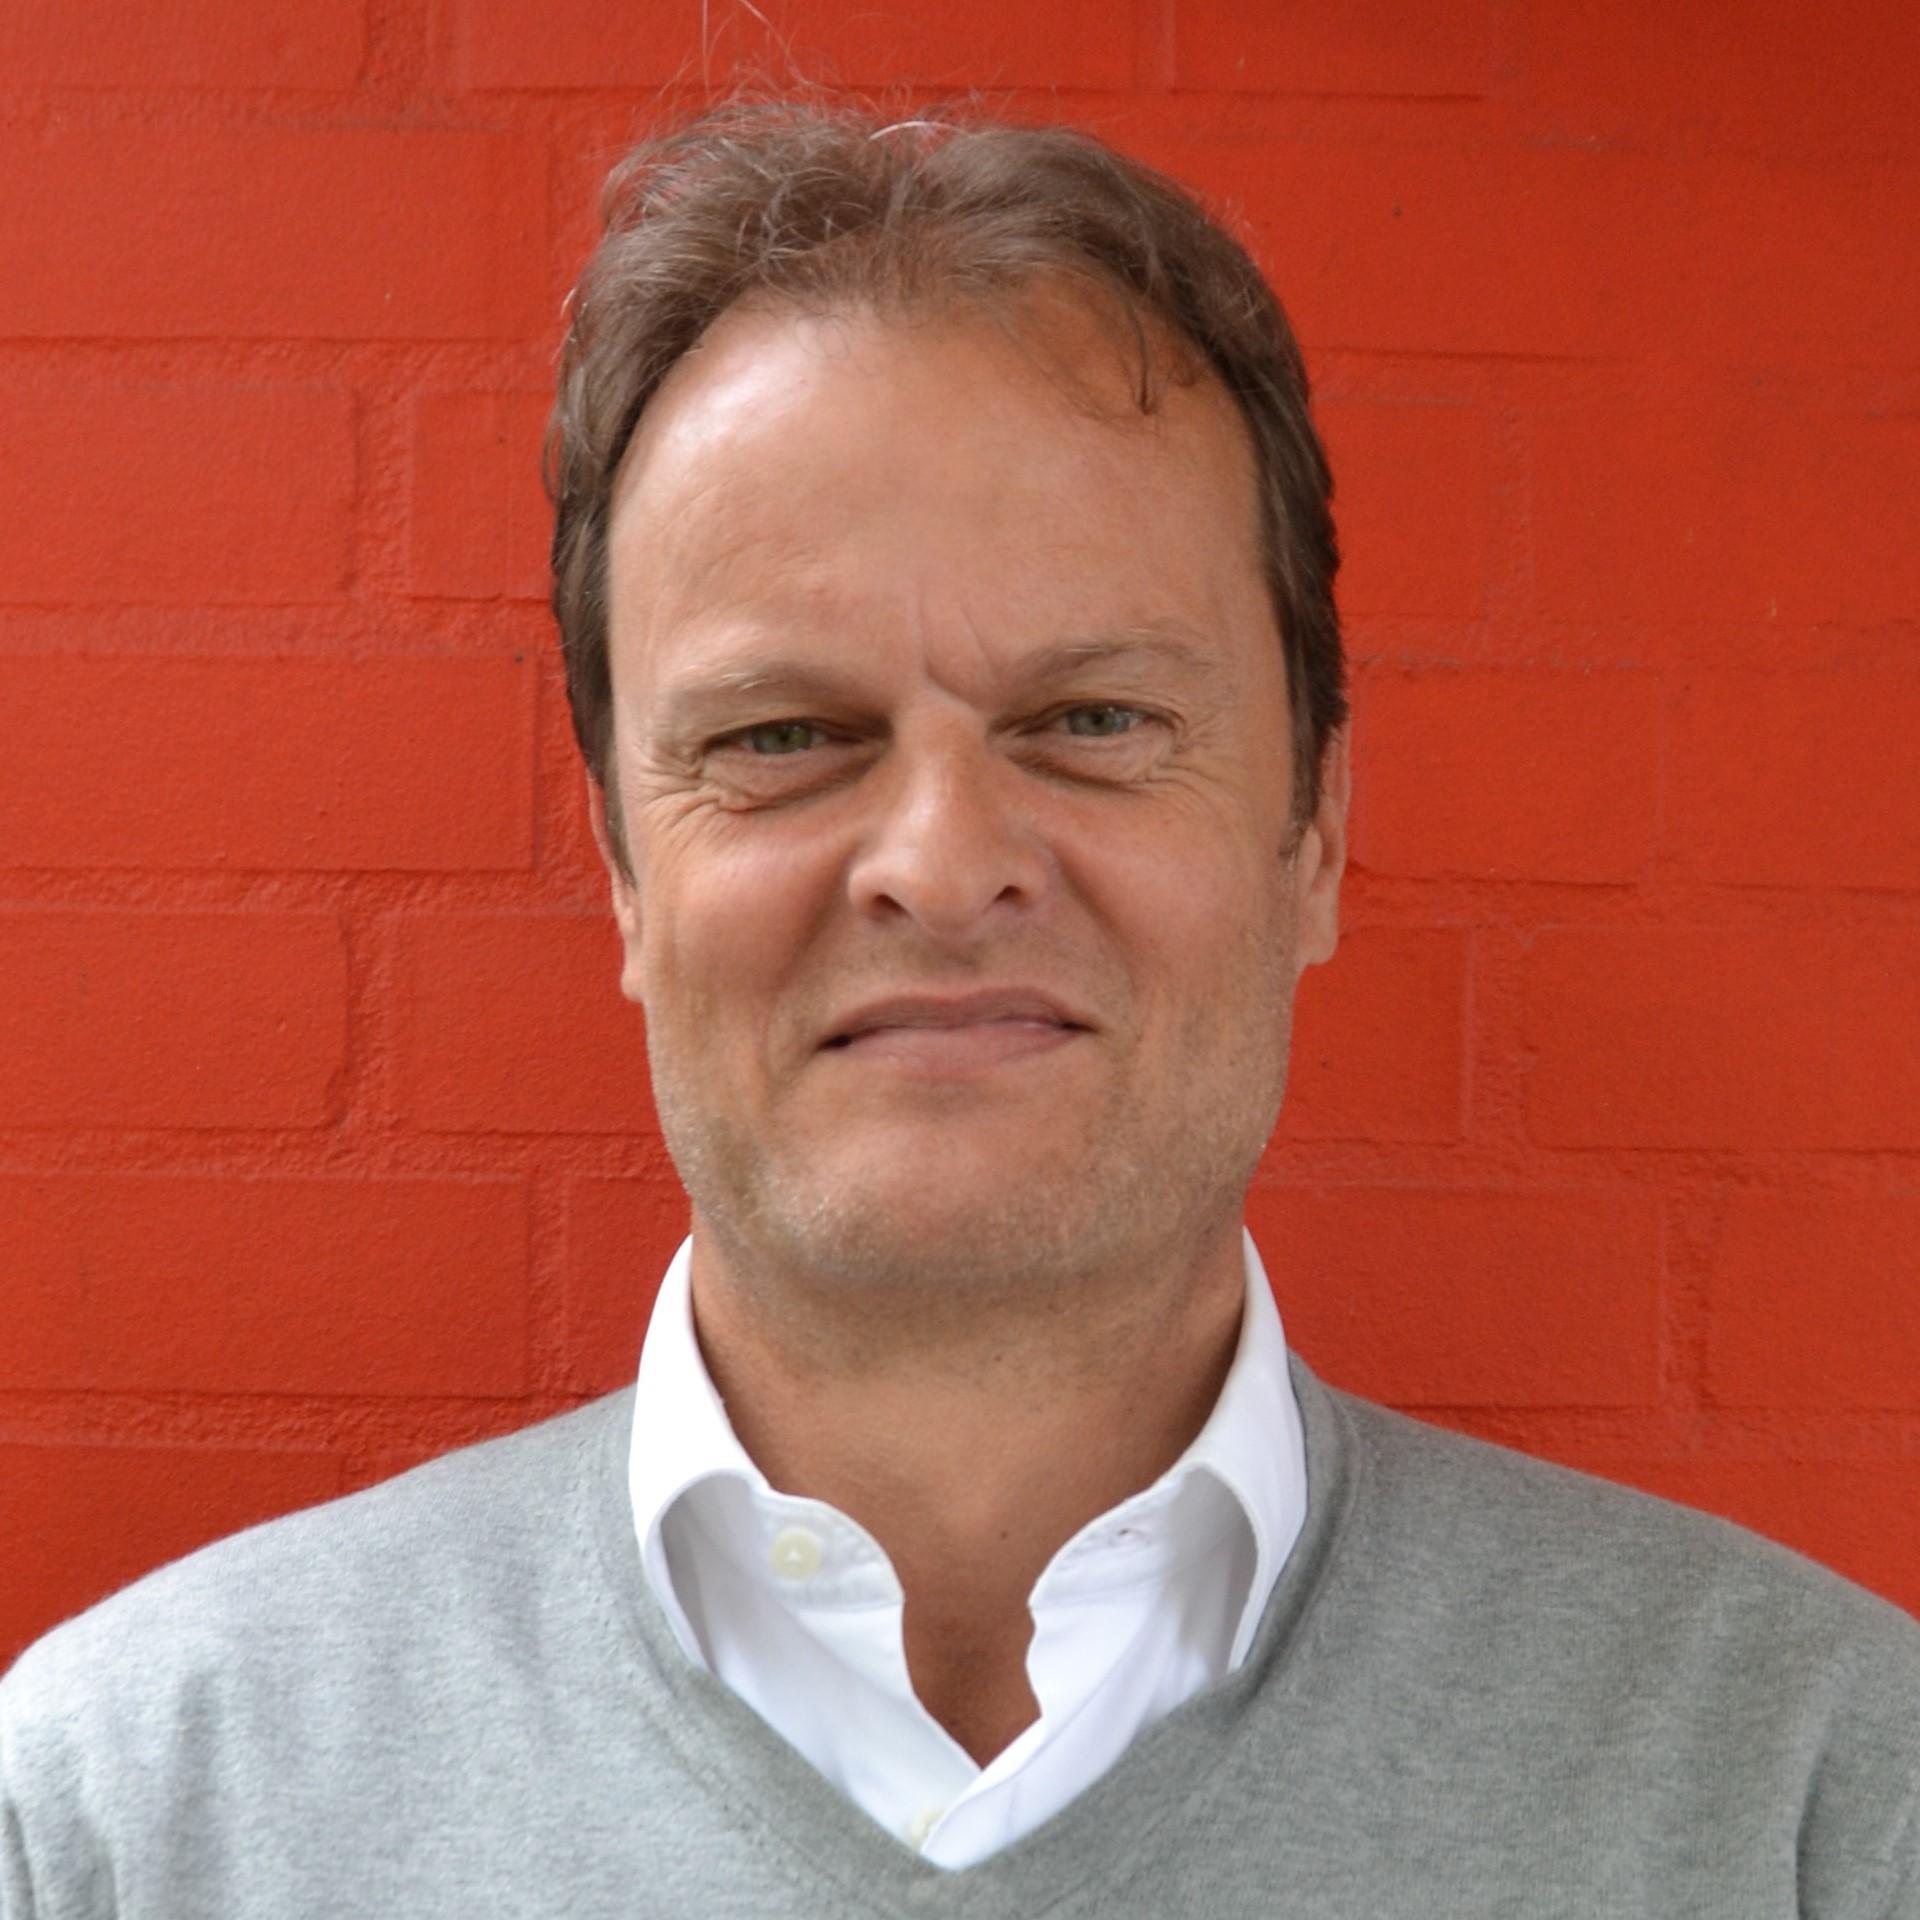 Timo Garstman